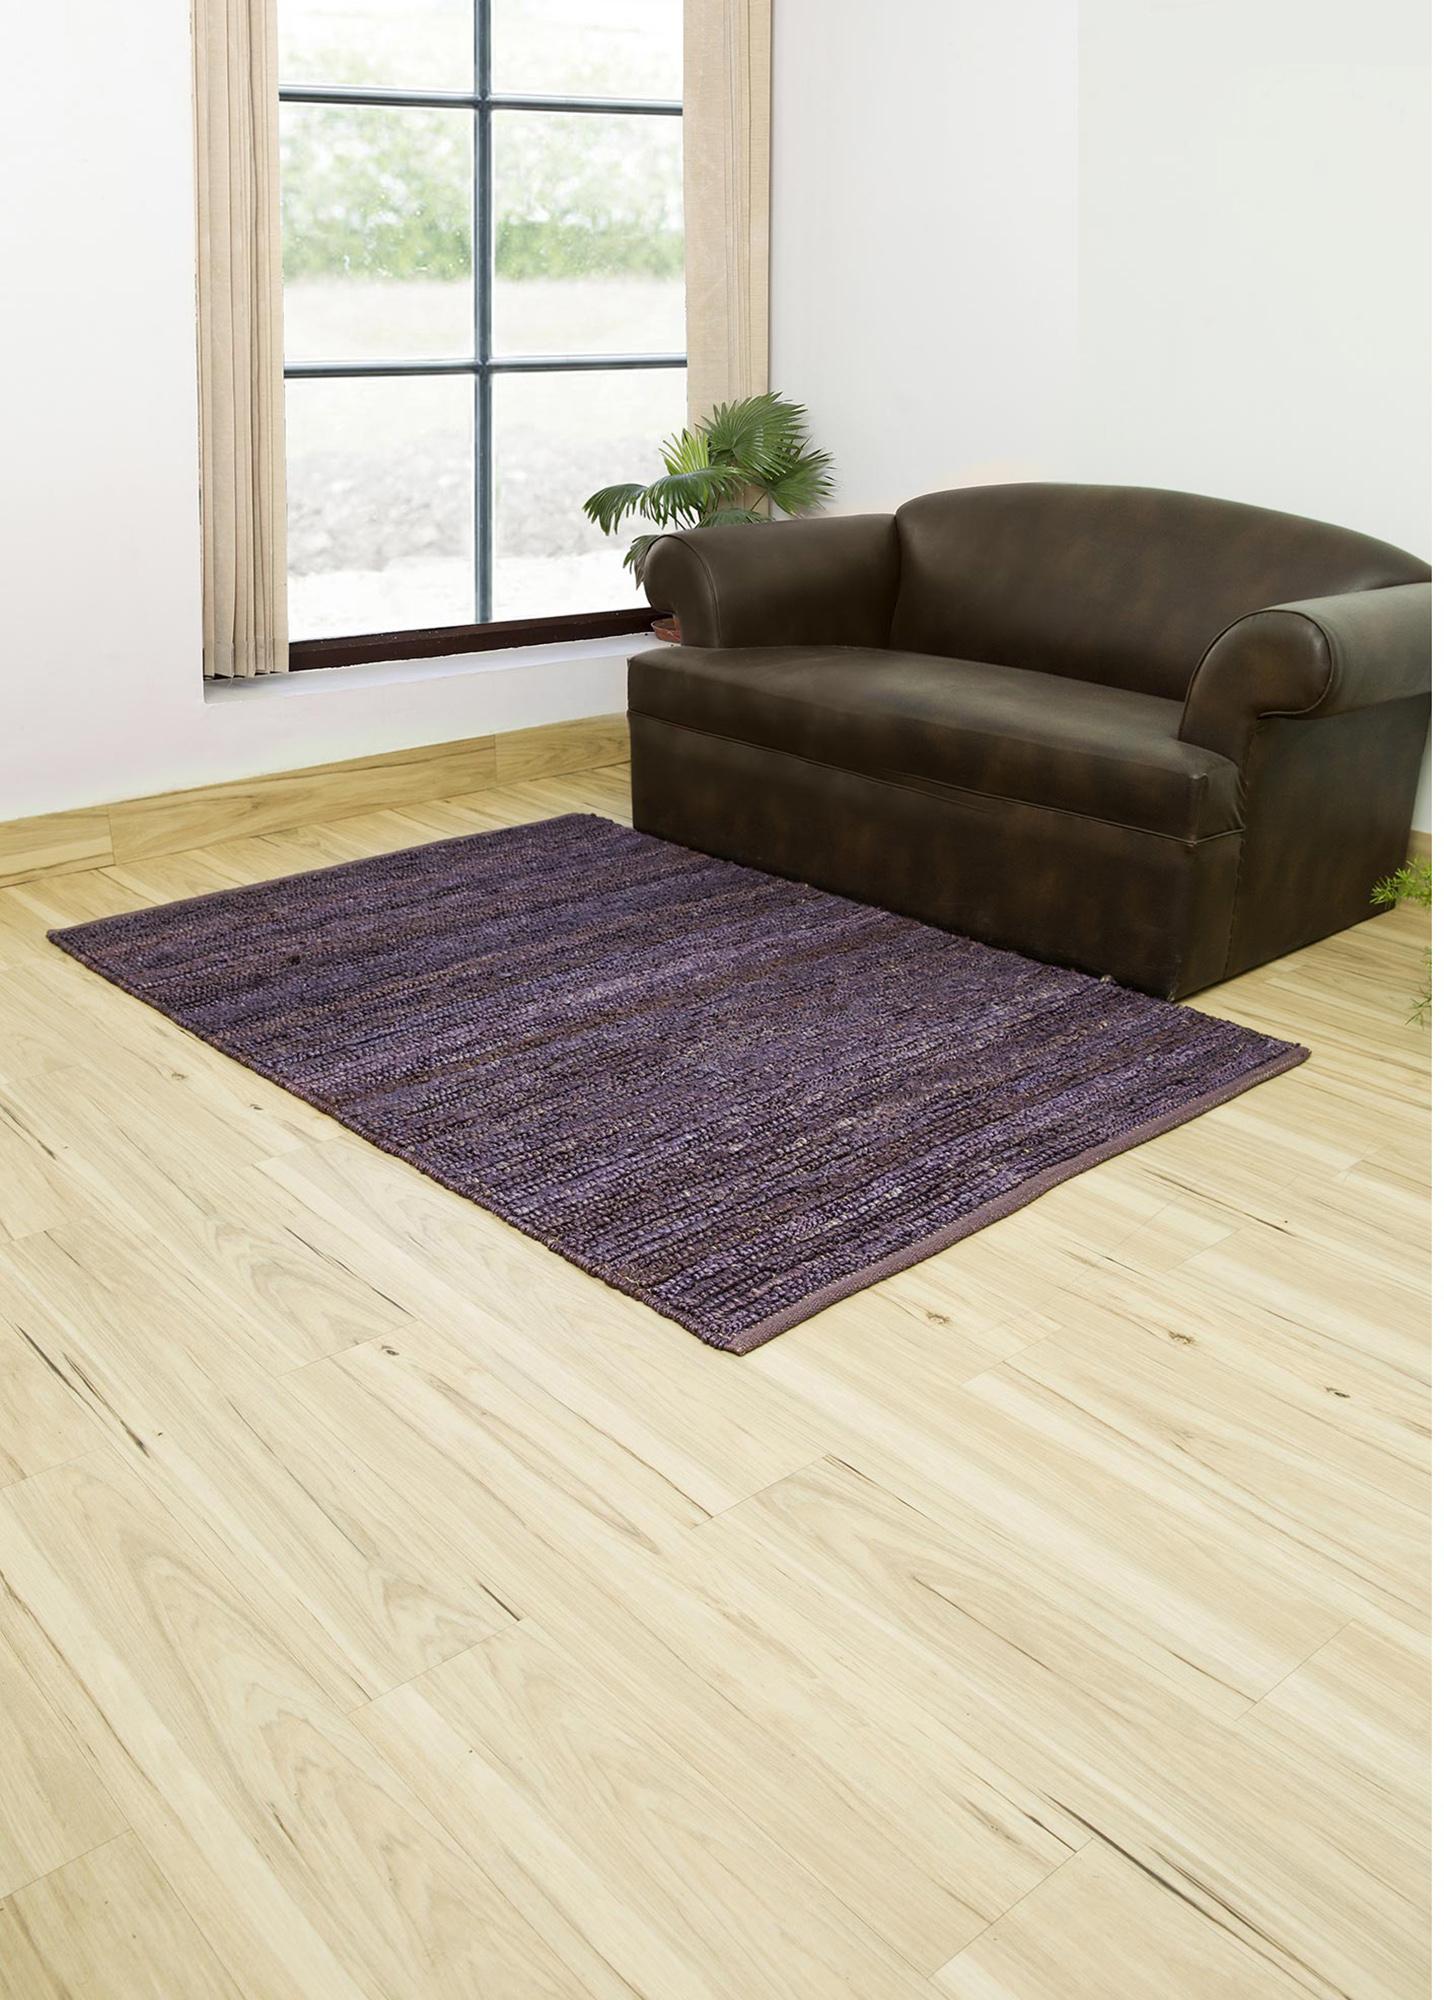 abrash pink and purple jute and hemp flat weaves Rug - RoomScene